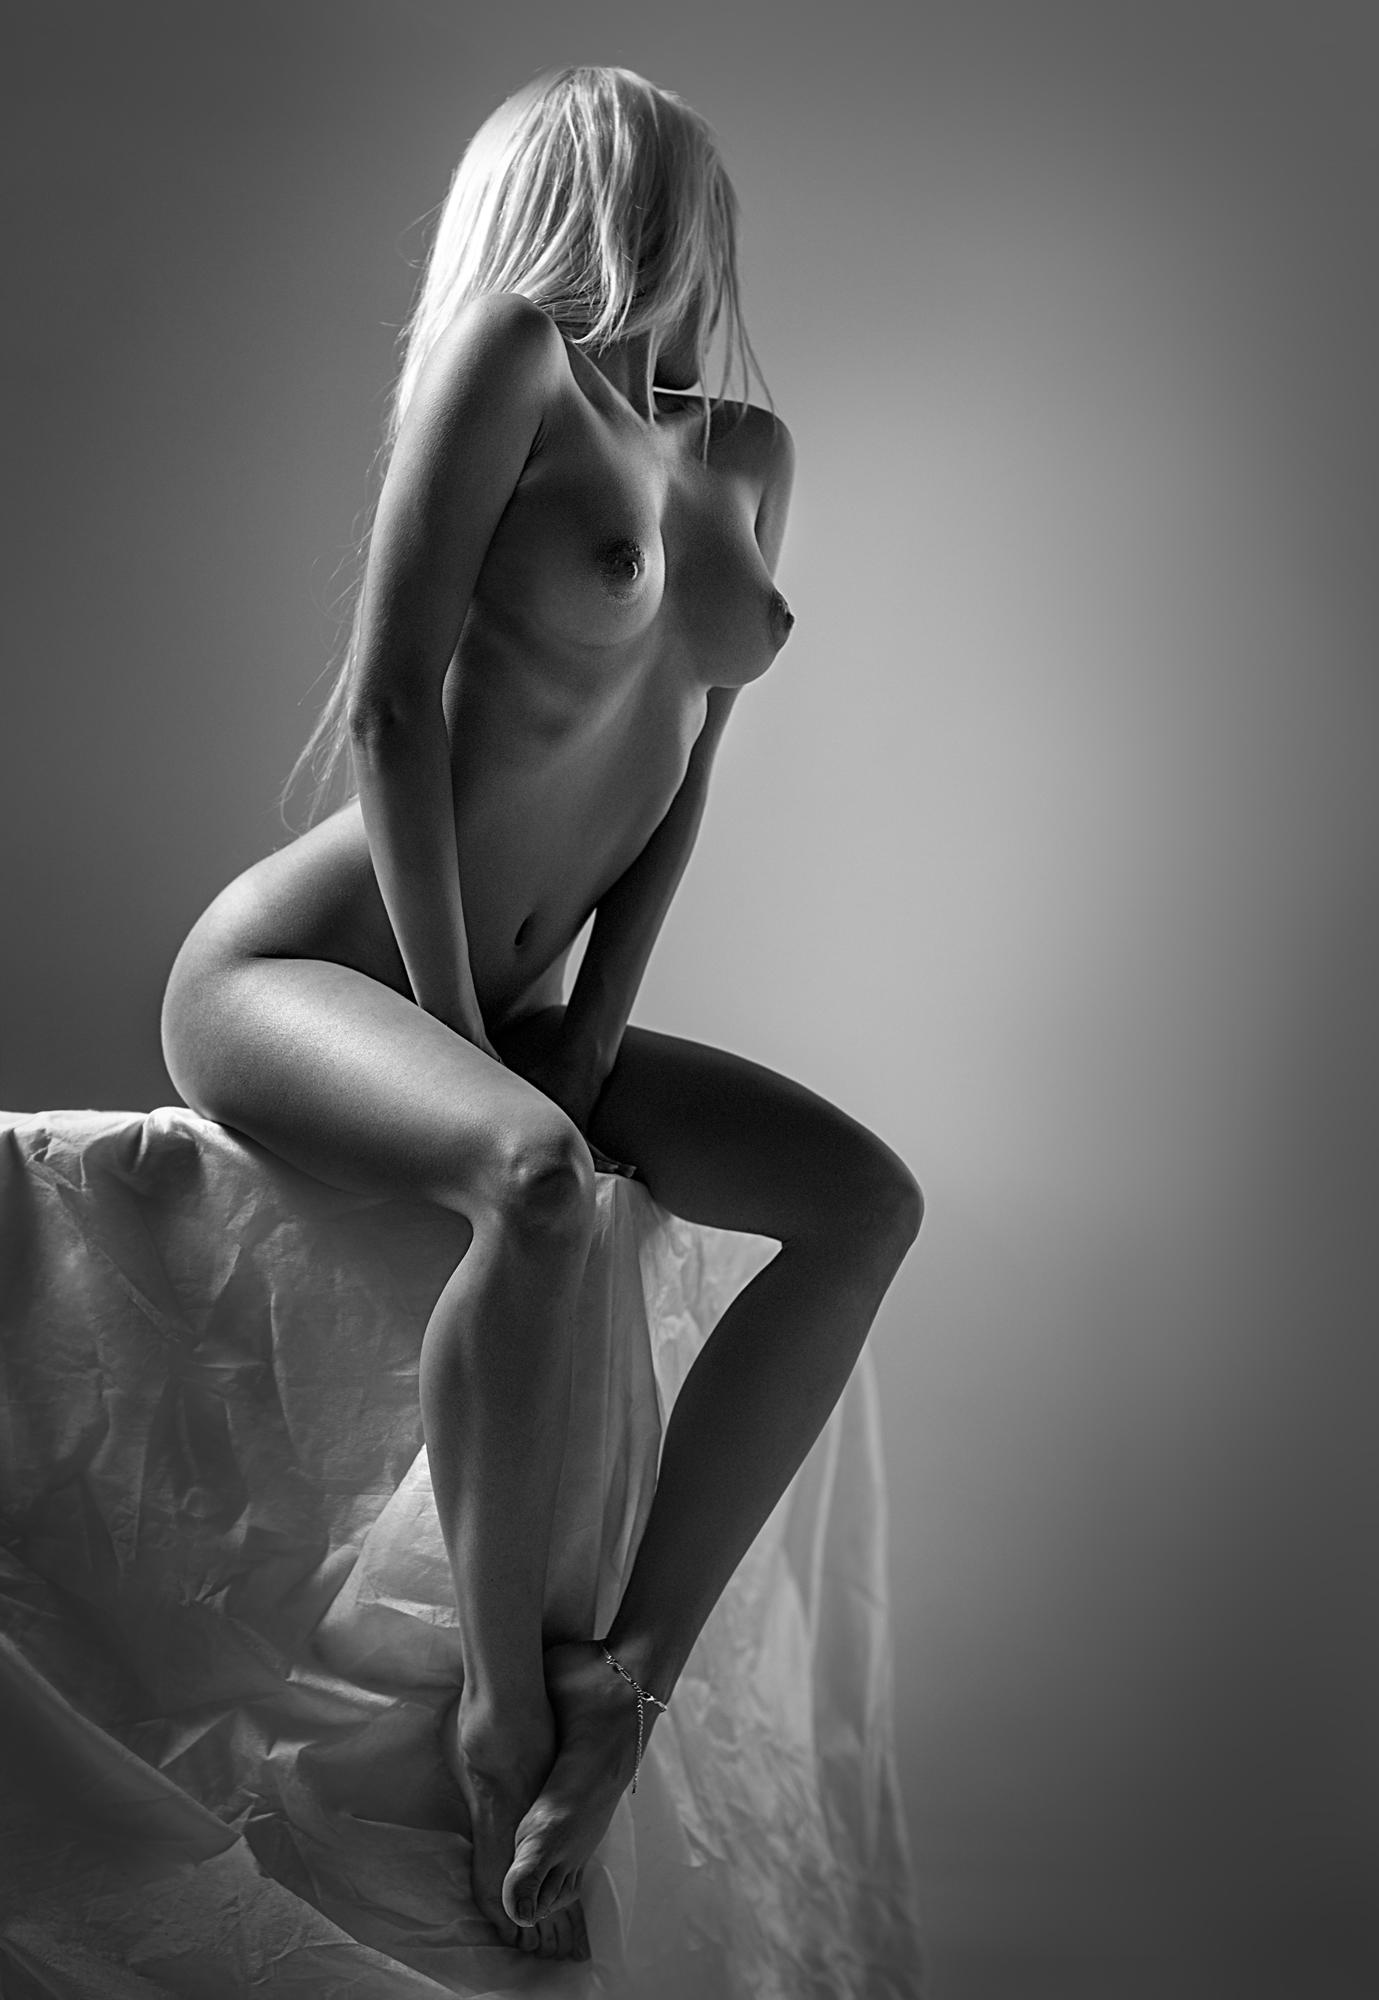 Erotic art nude woman